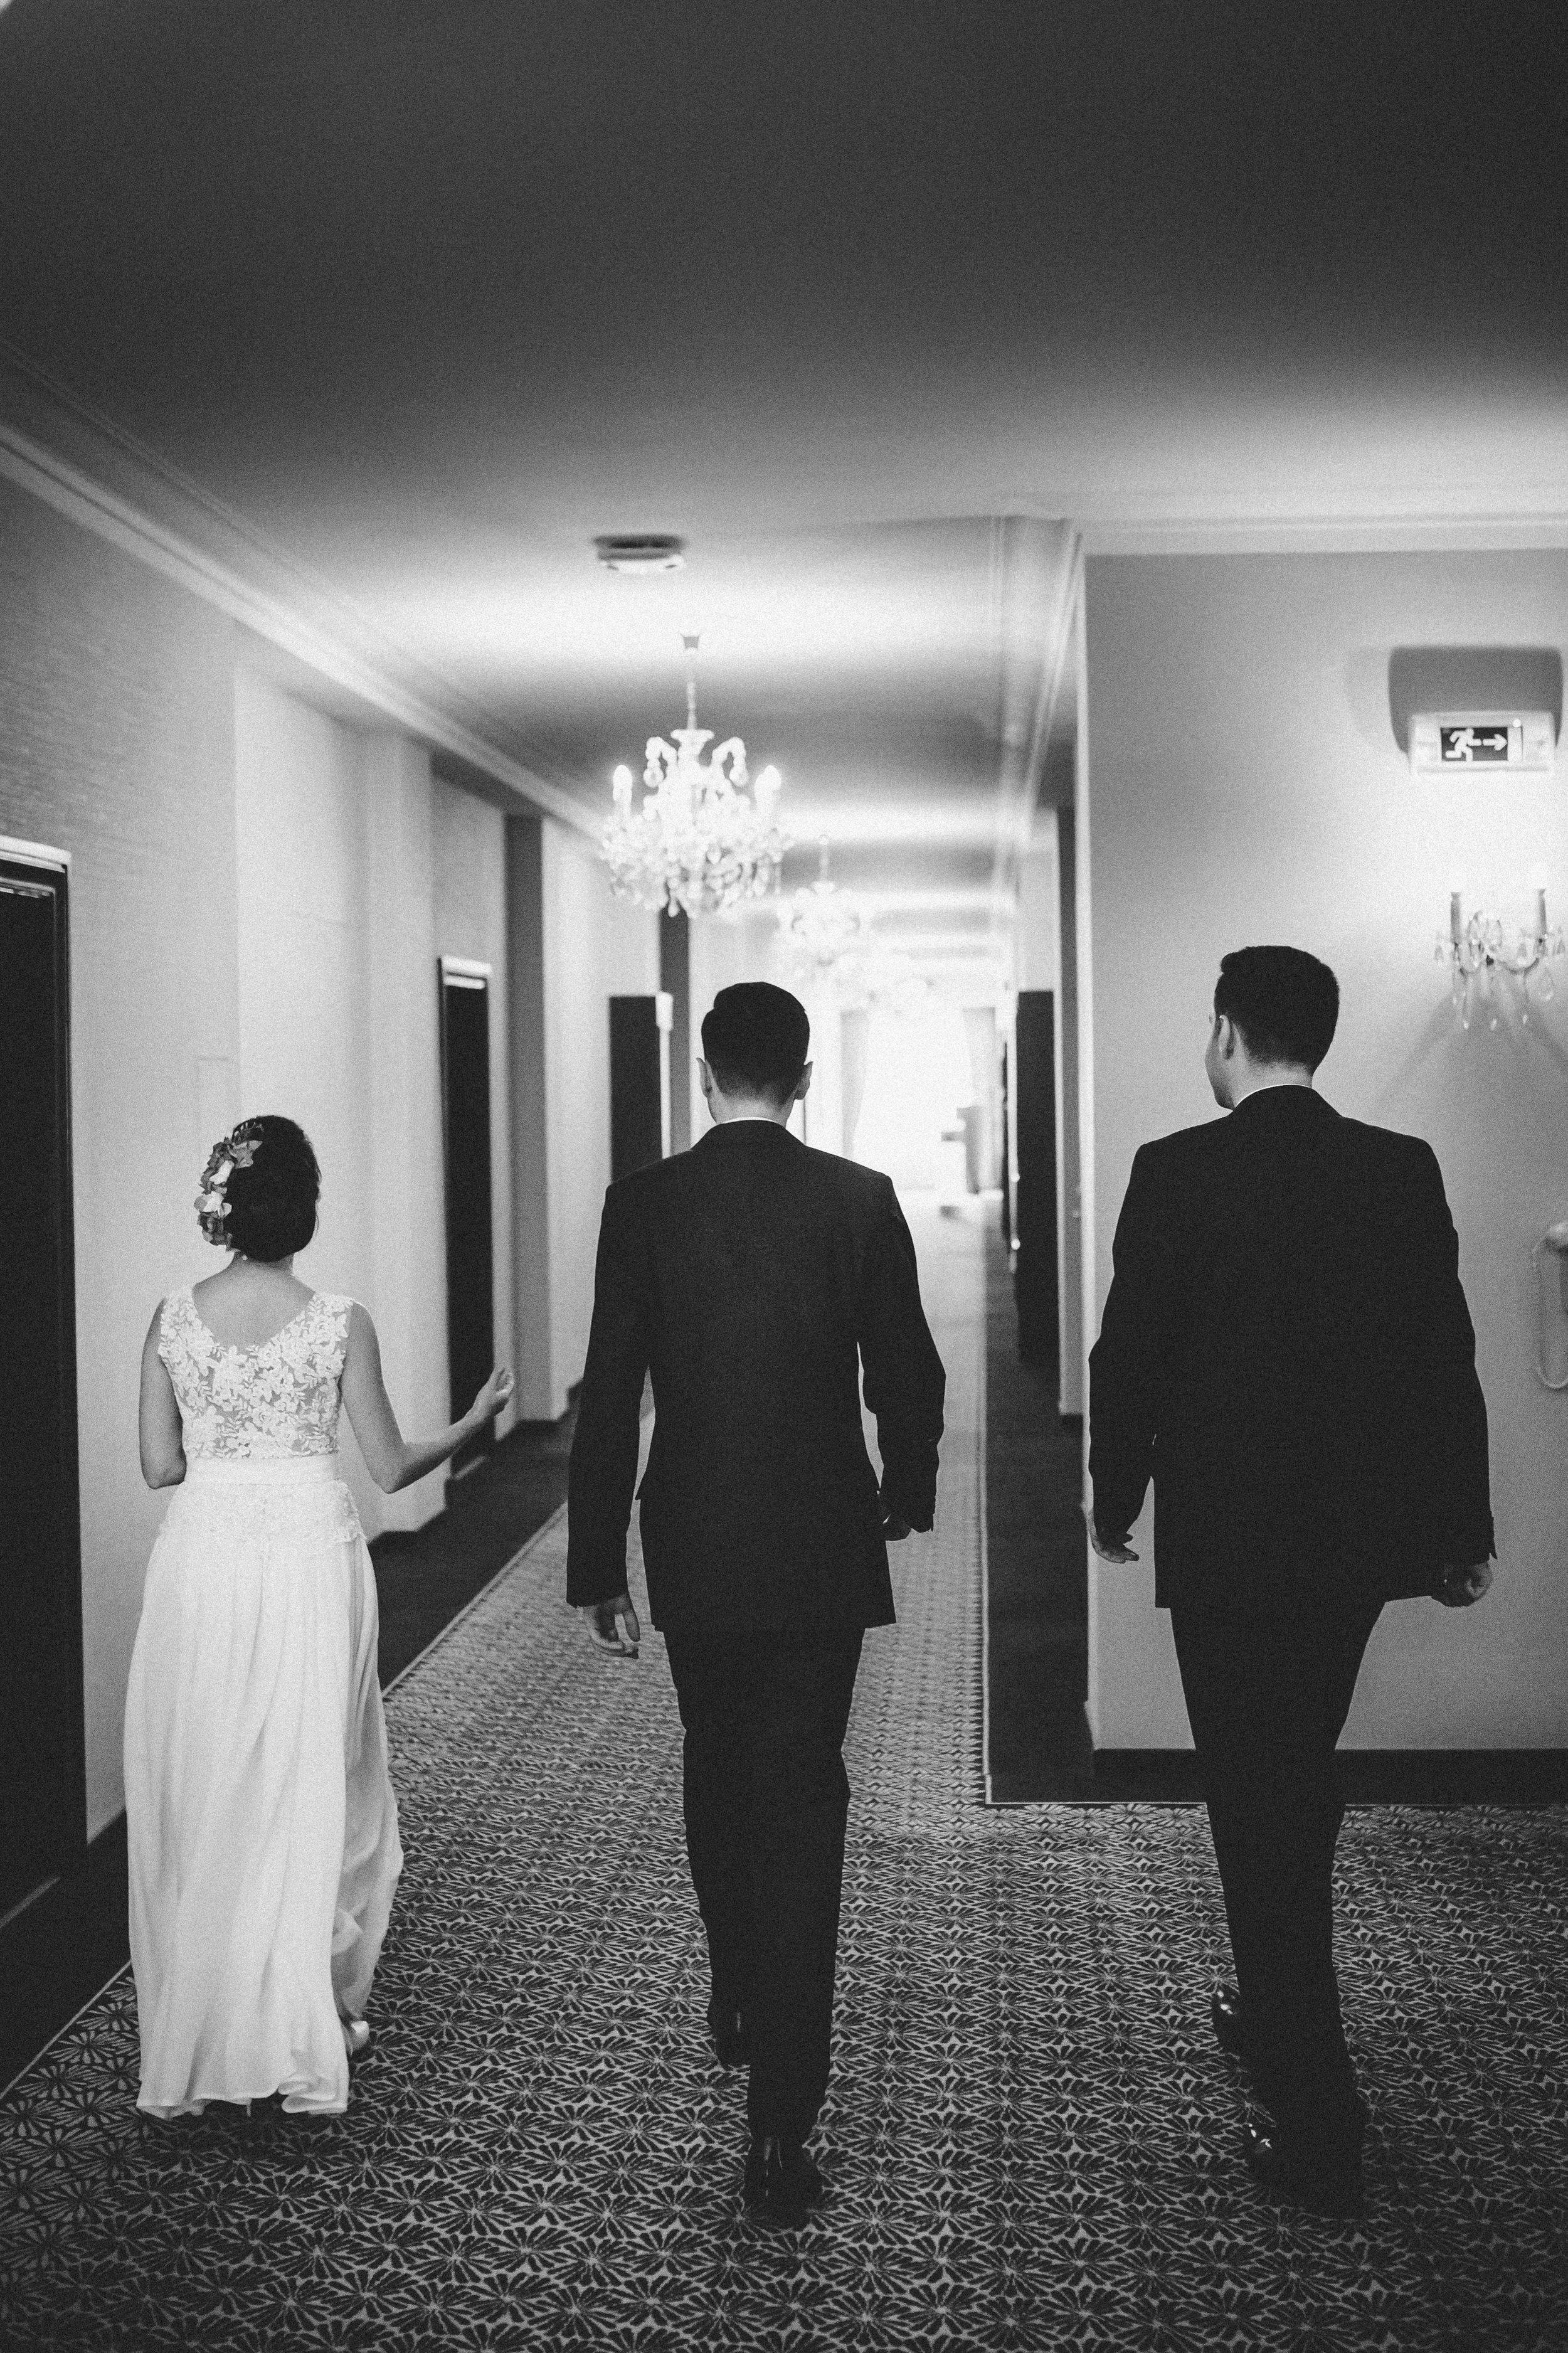 destination-wedding-photographer-bratislava-slovakia-europe-bw-documentary.jpg